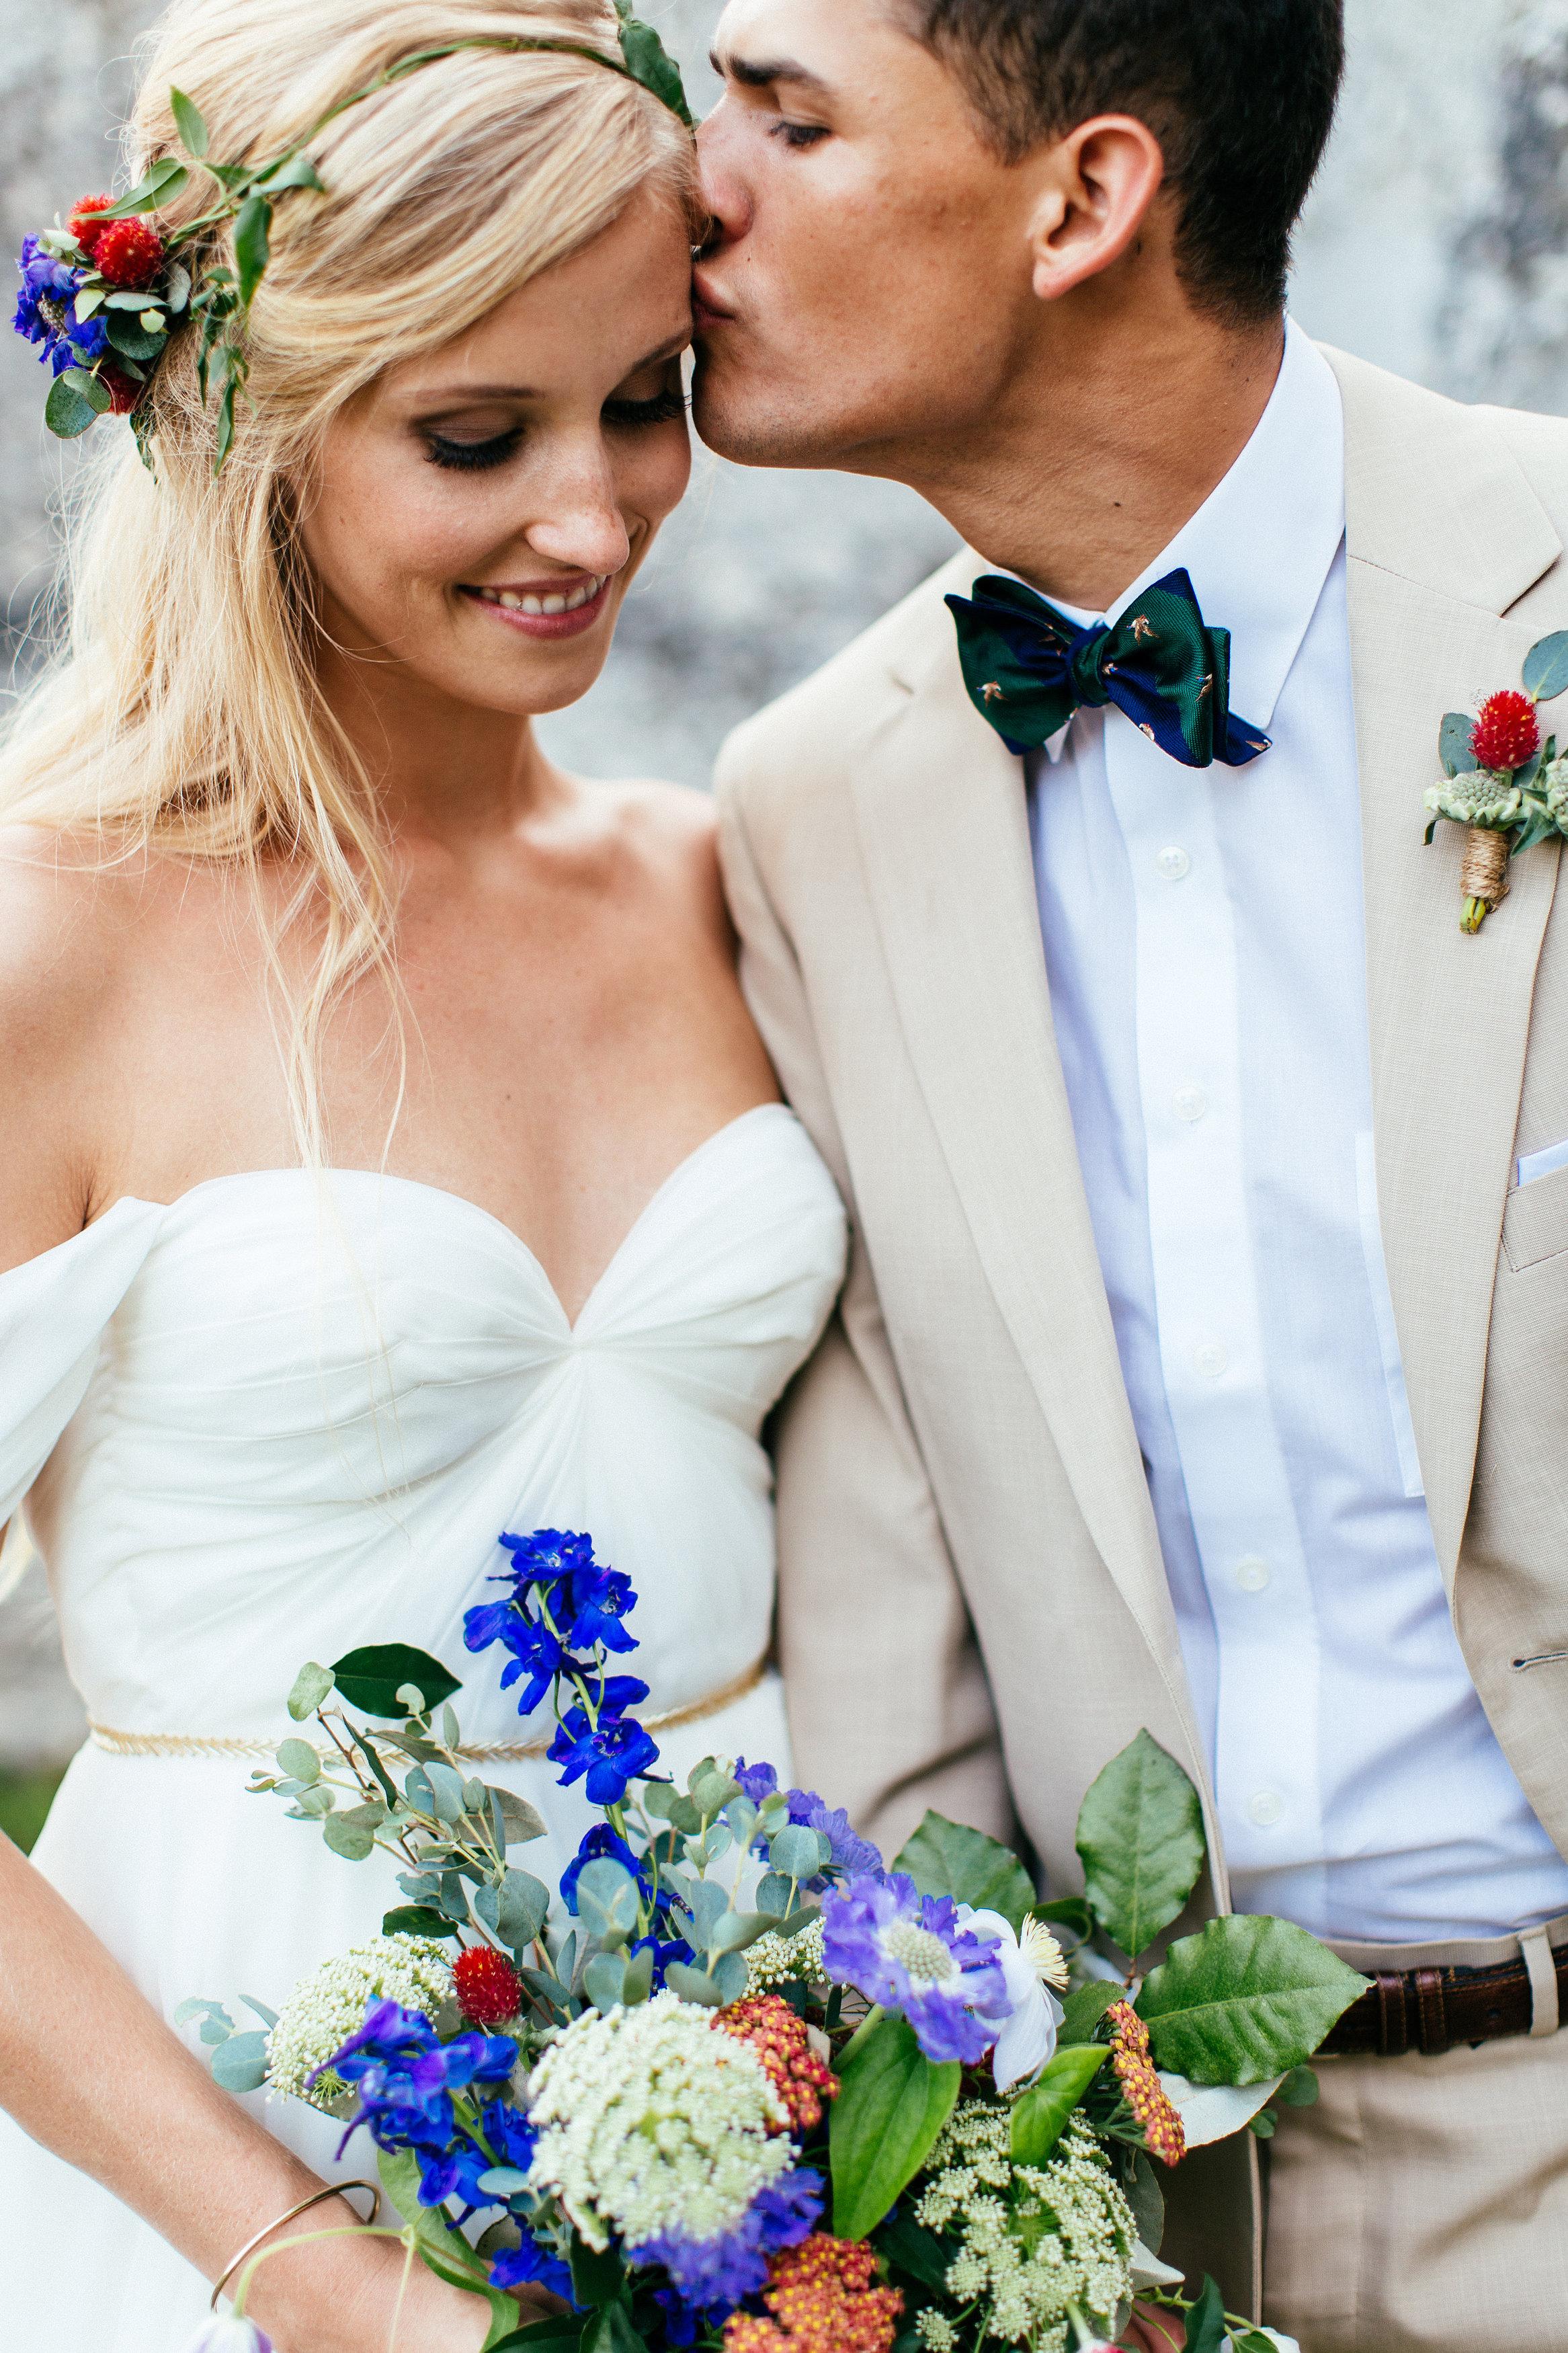 christina-karst-photography-ivory-and-beau-bridal-boutique-sarah-seven-lafayette-boho-bride-boho-bridal-boutique-indie-bridal-boutique-savannah-bridal-boutique-savannah-wedding-dresses-savannah-bridal-gowns-21.jpg